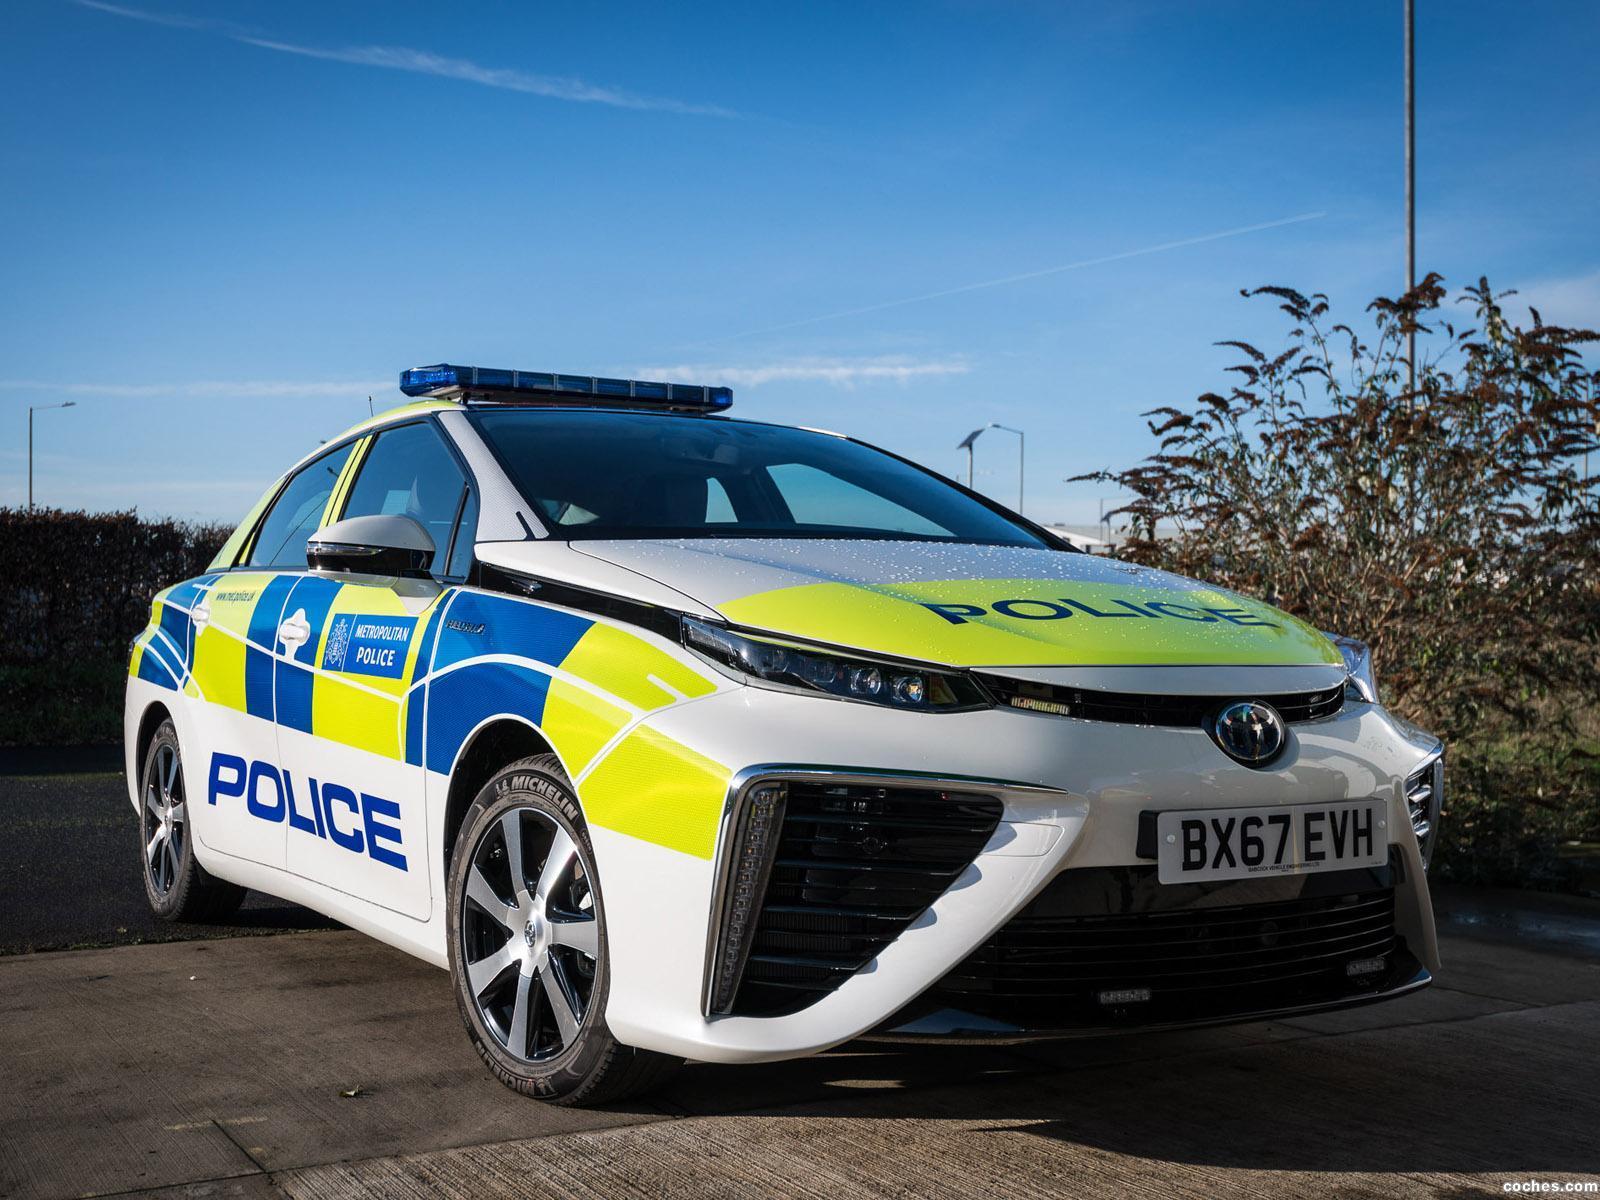 toyota_mirai-police-uk-2018_r4.jpg